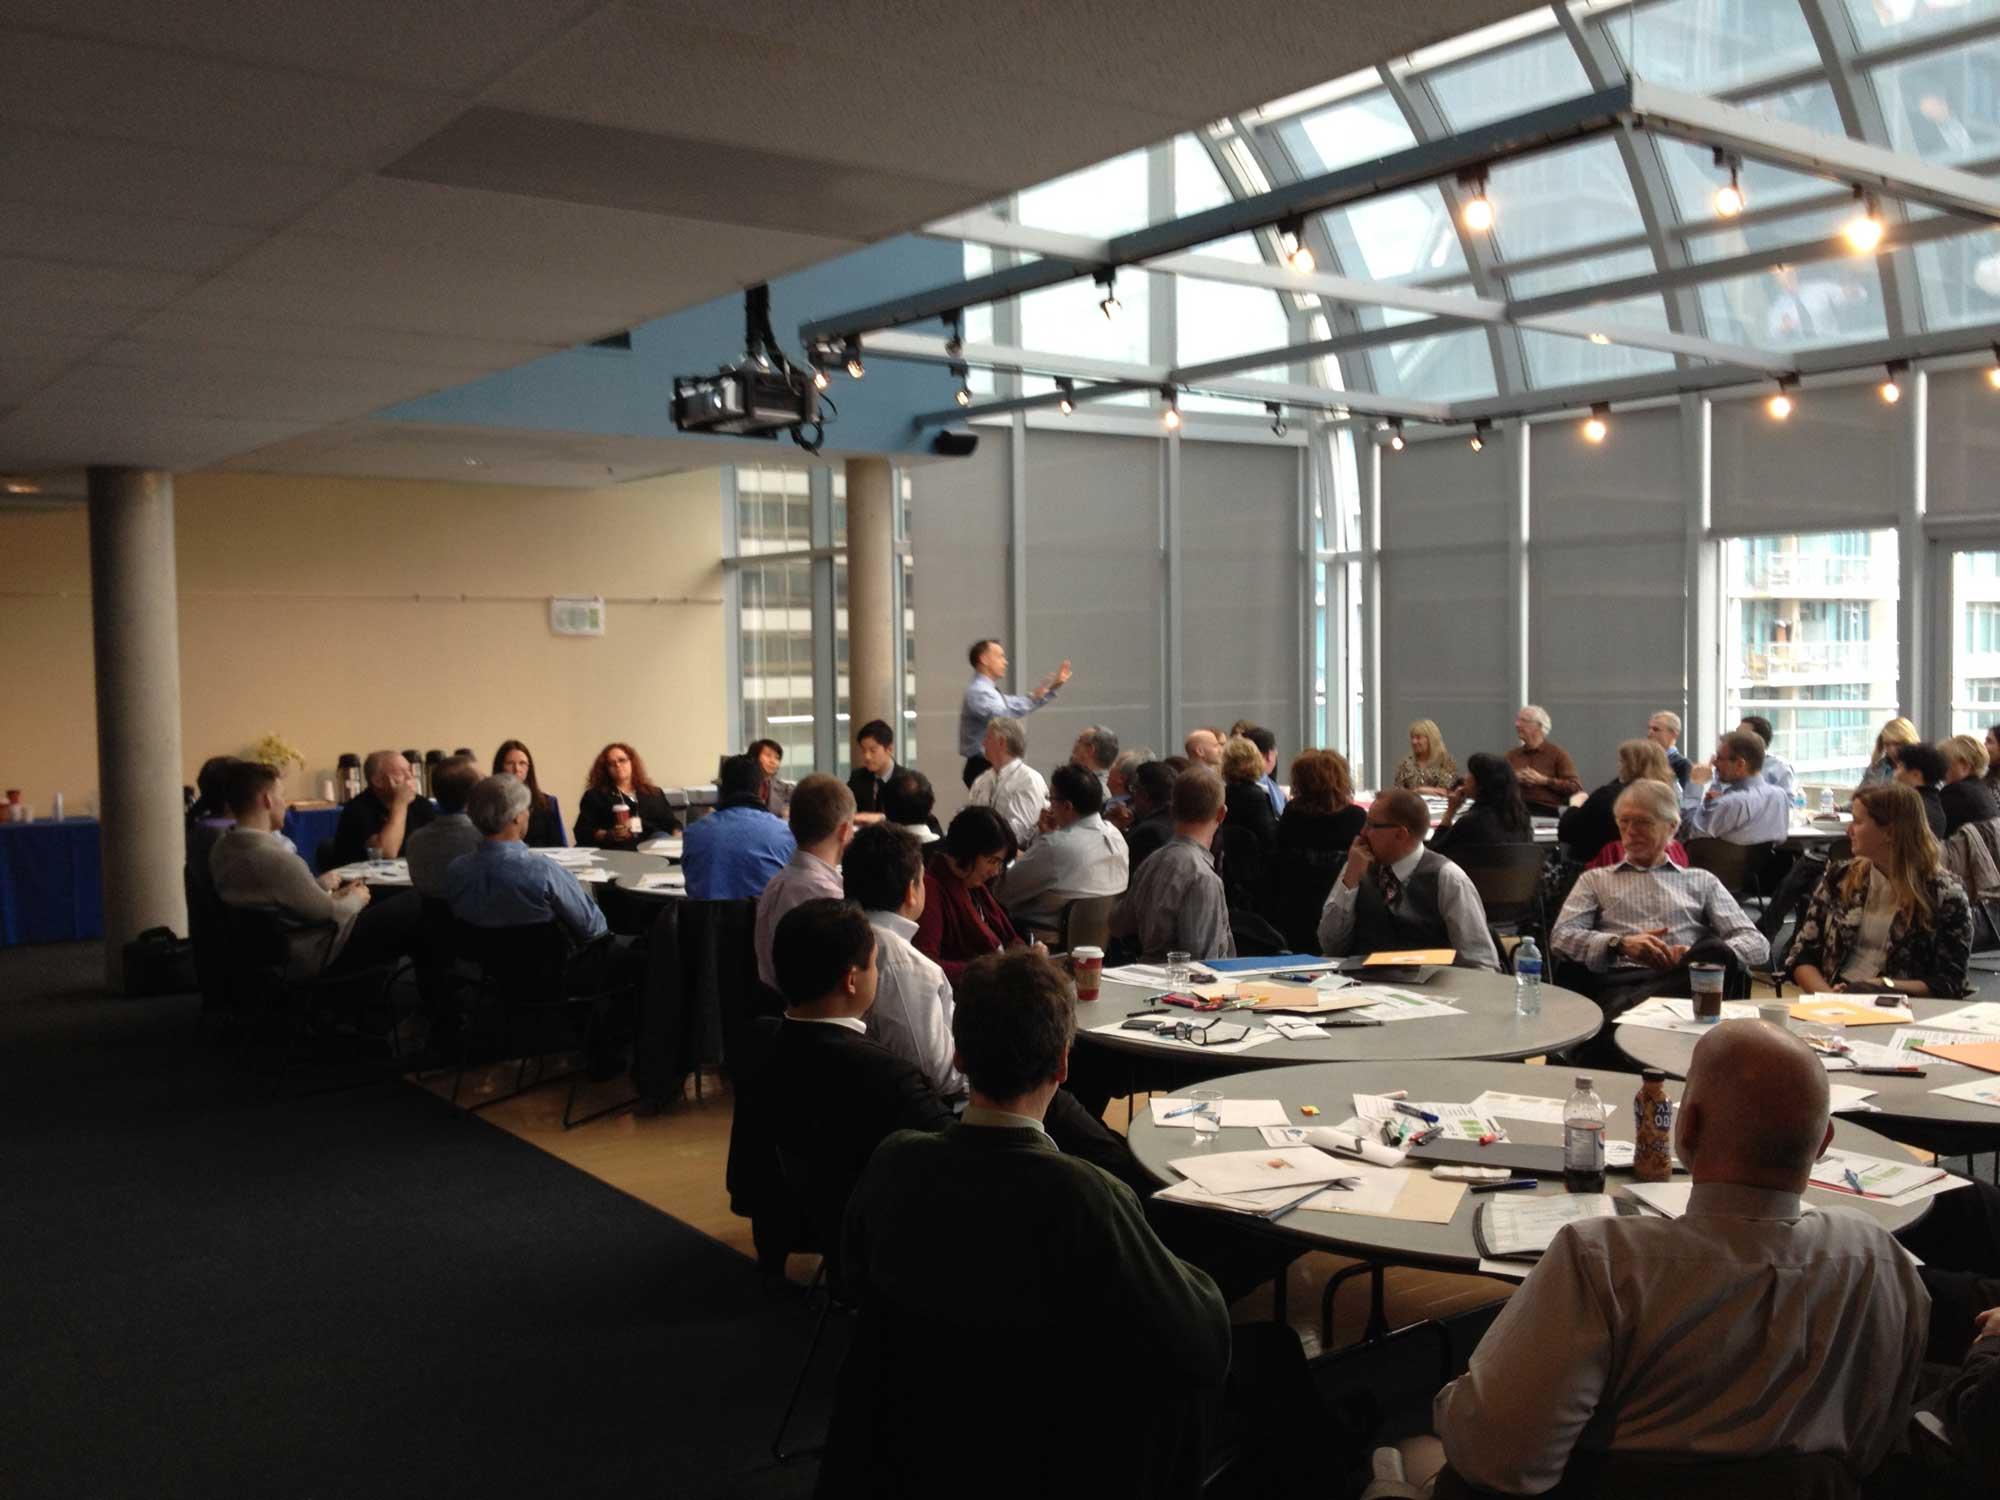 Strategic planning facilitator business strategy consultant